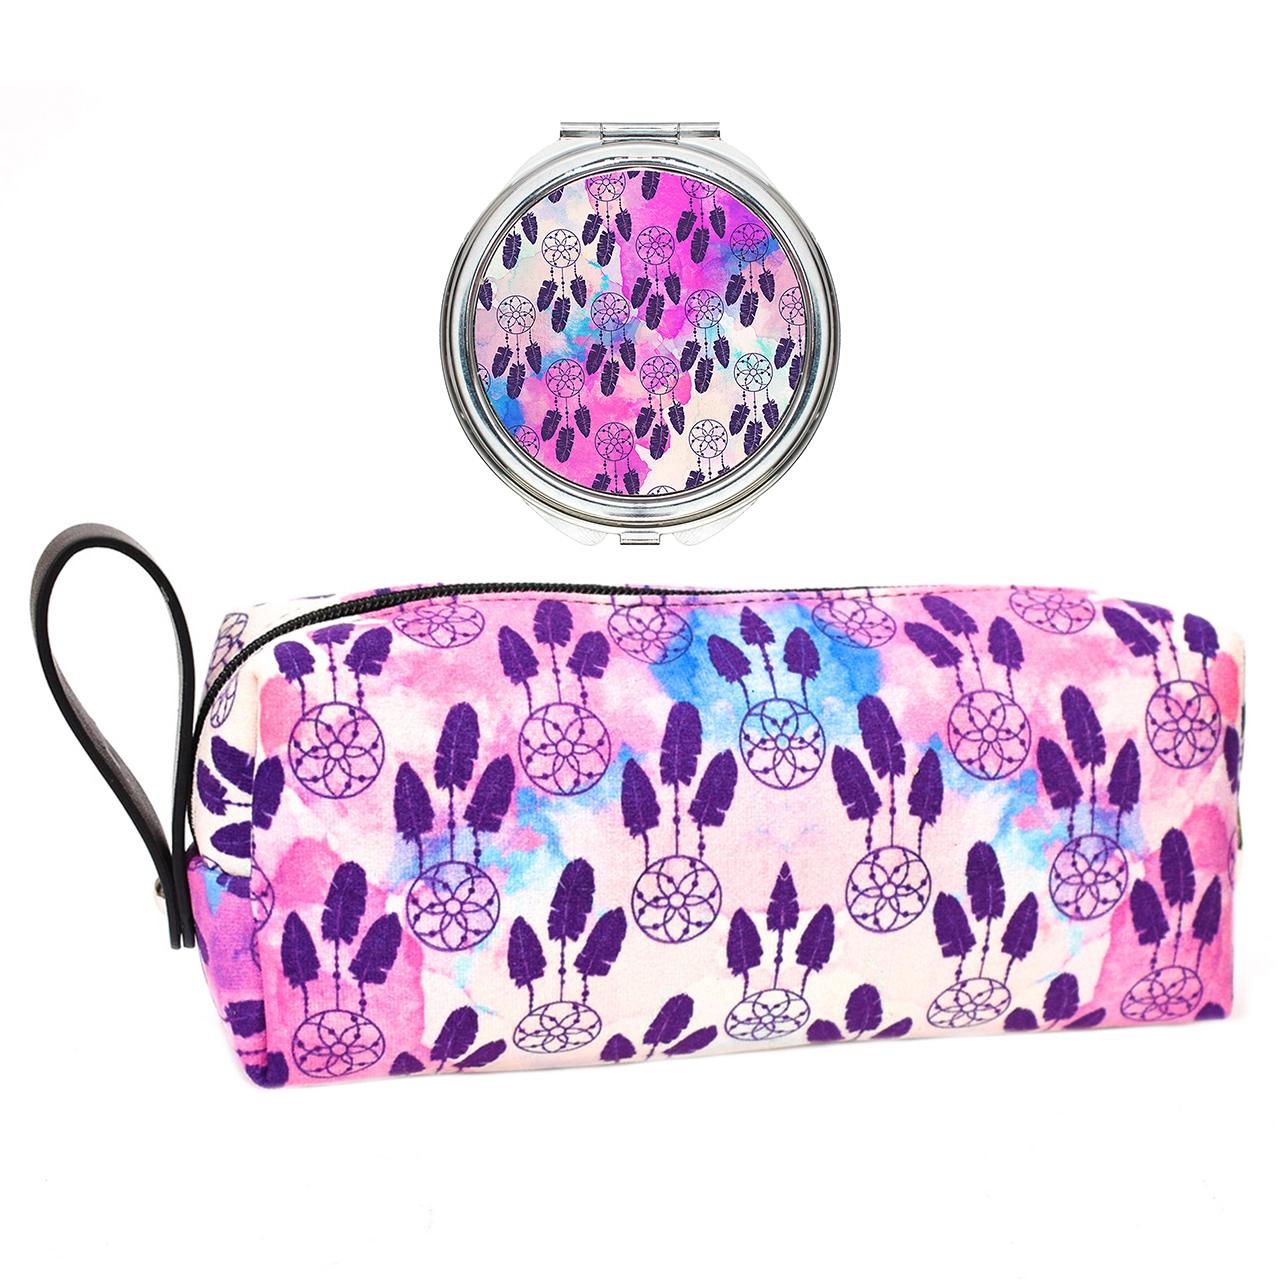 قیمت پک کیف و آینه آرایشی لومانا کد 001